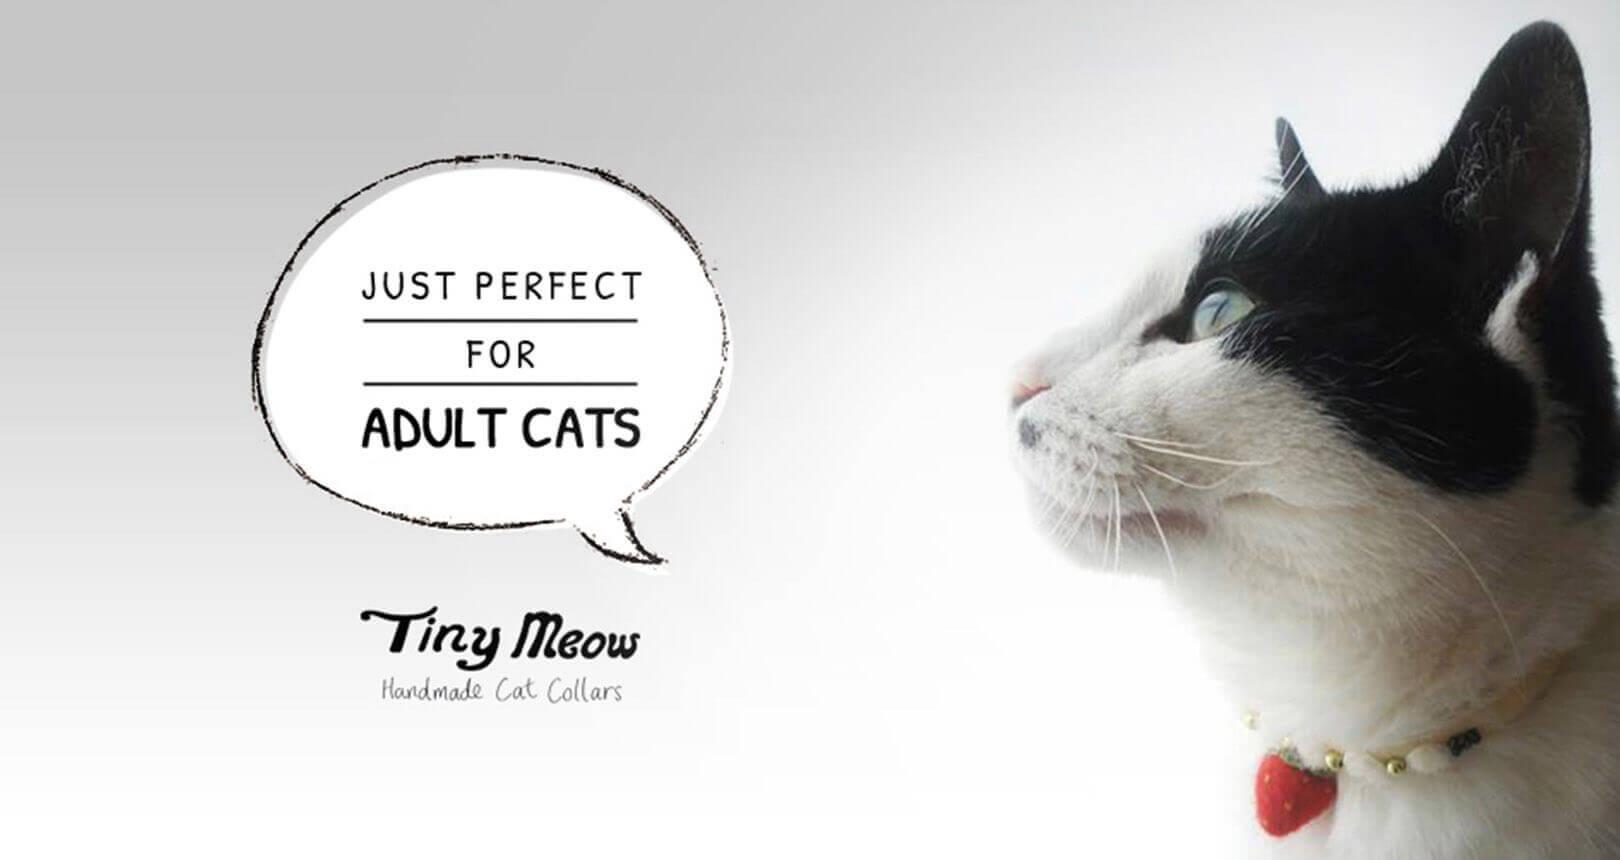 Tiny Meow branding